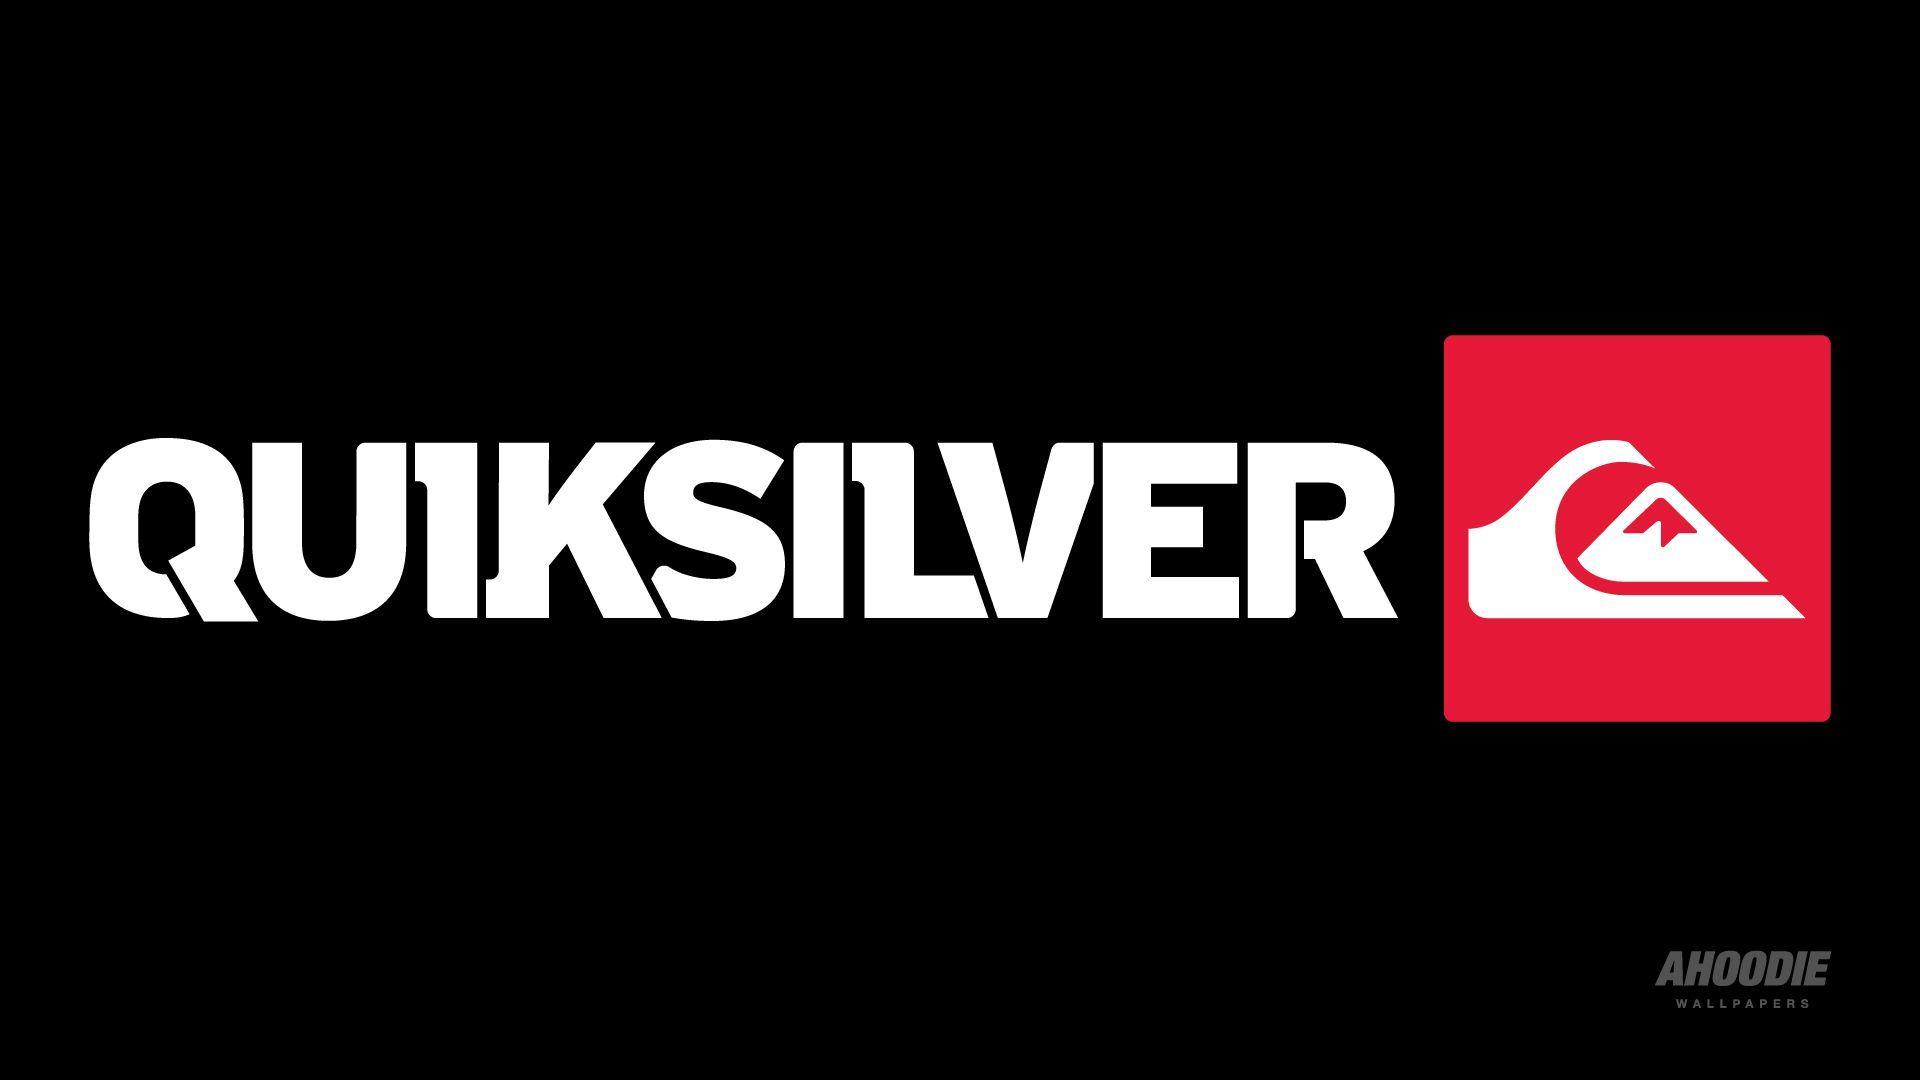 Quiksilver Logo Wallpapers Wallpaper Cave Surf Logo Quiksilver Wallpaper Branding Design Inspiration